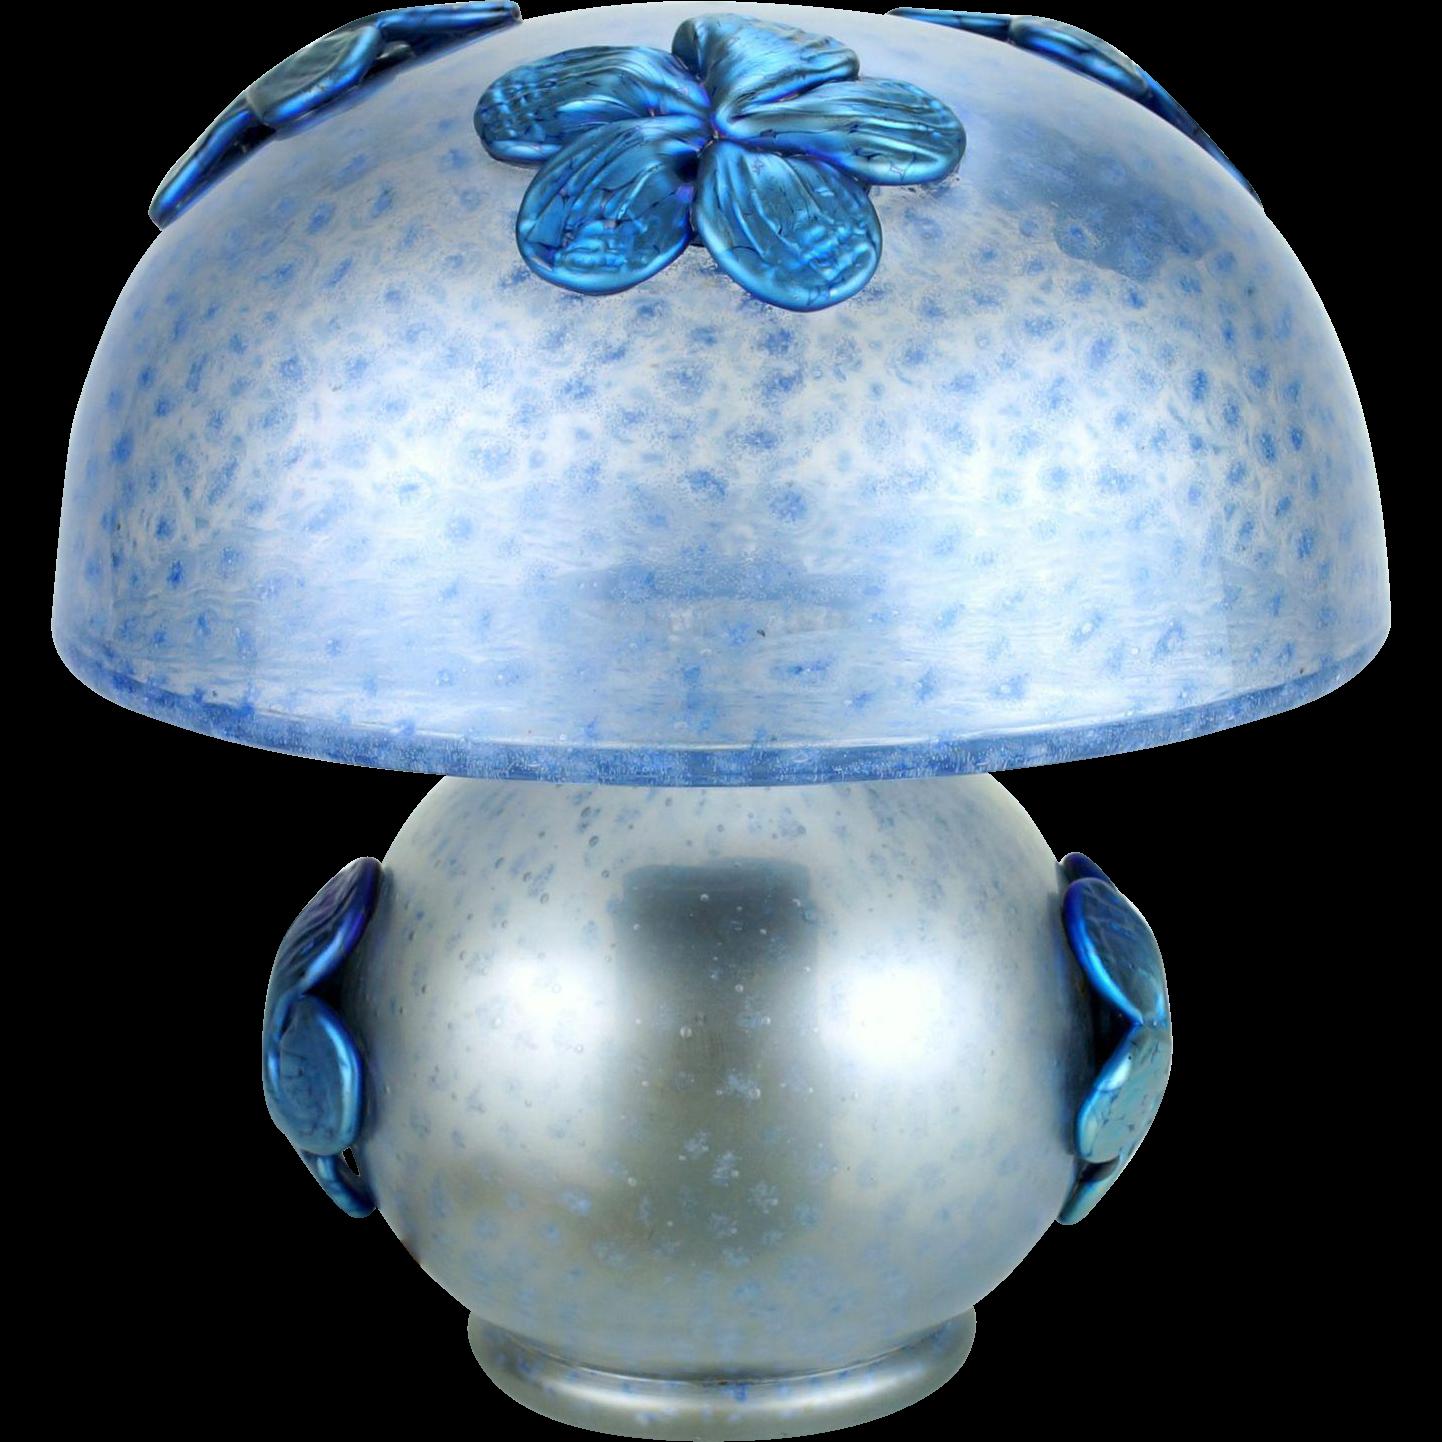 Loetz Deco Period lamp with applied blue Papillon flowers